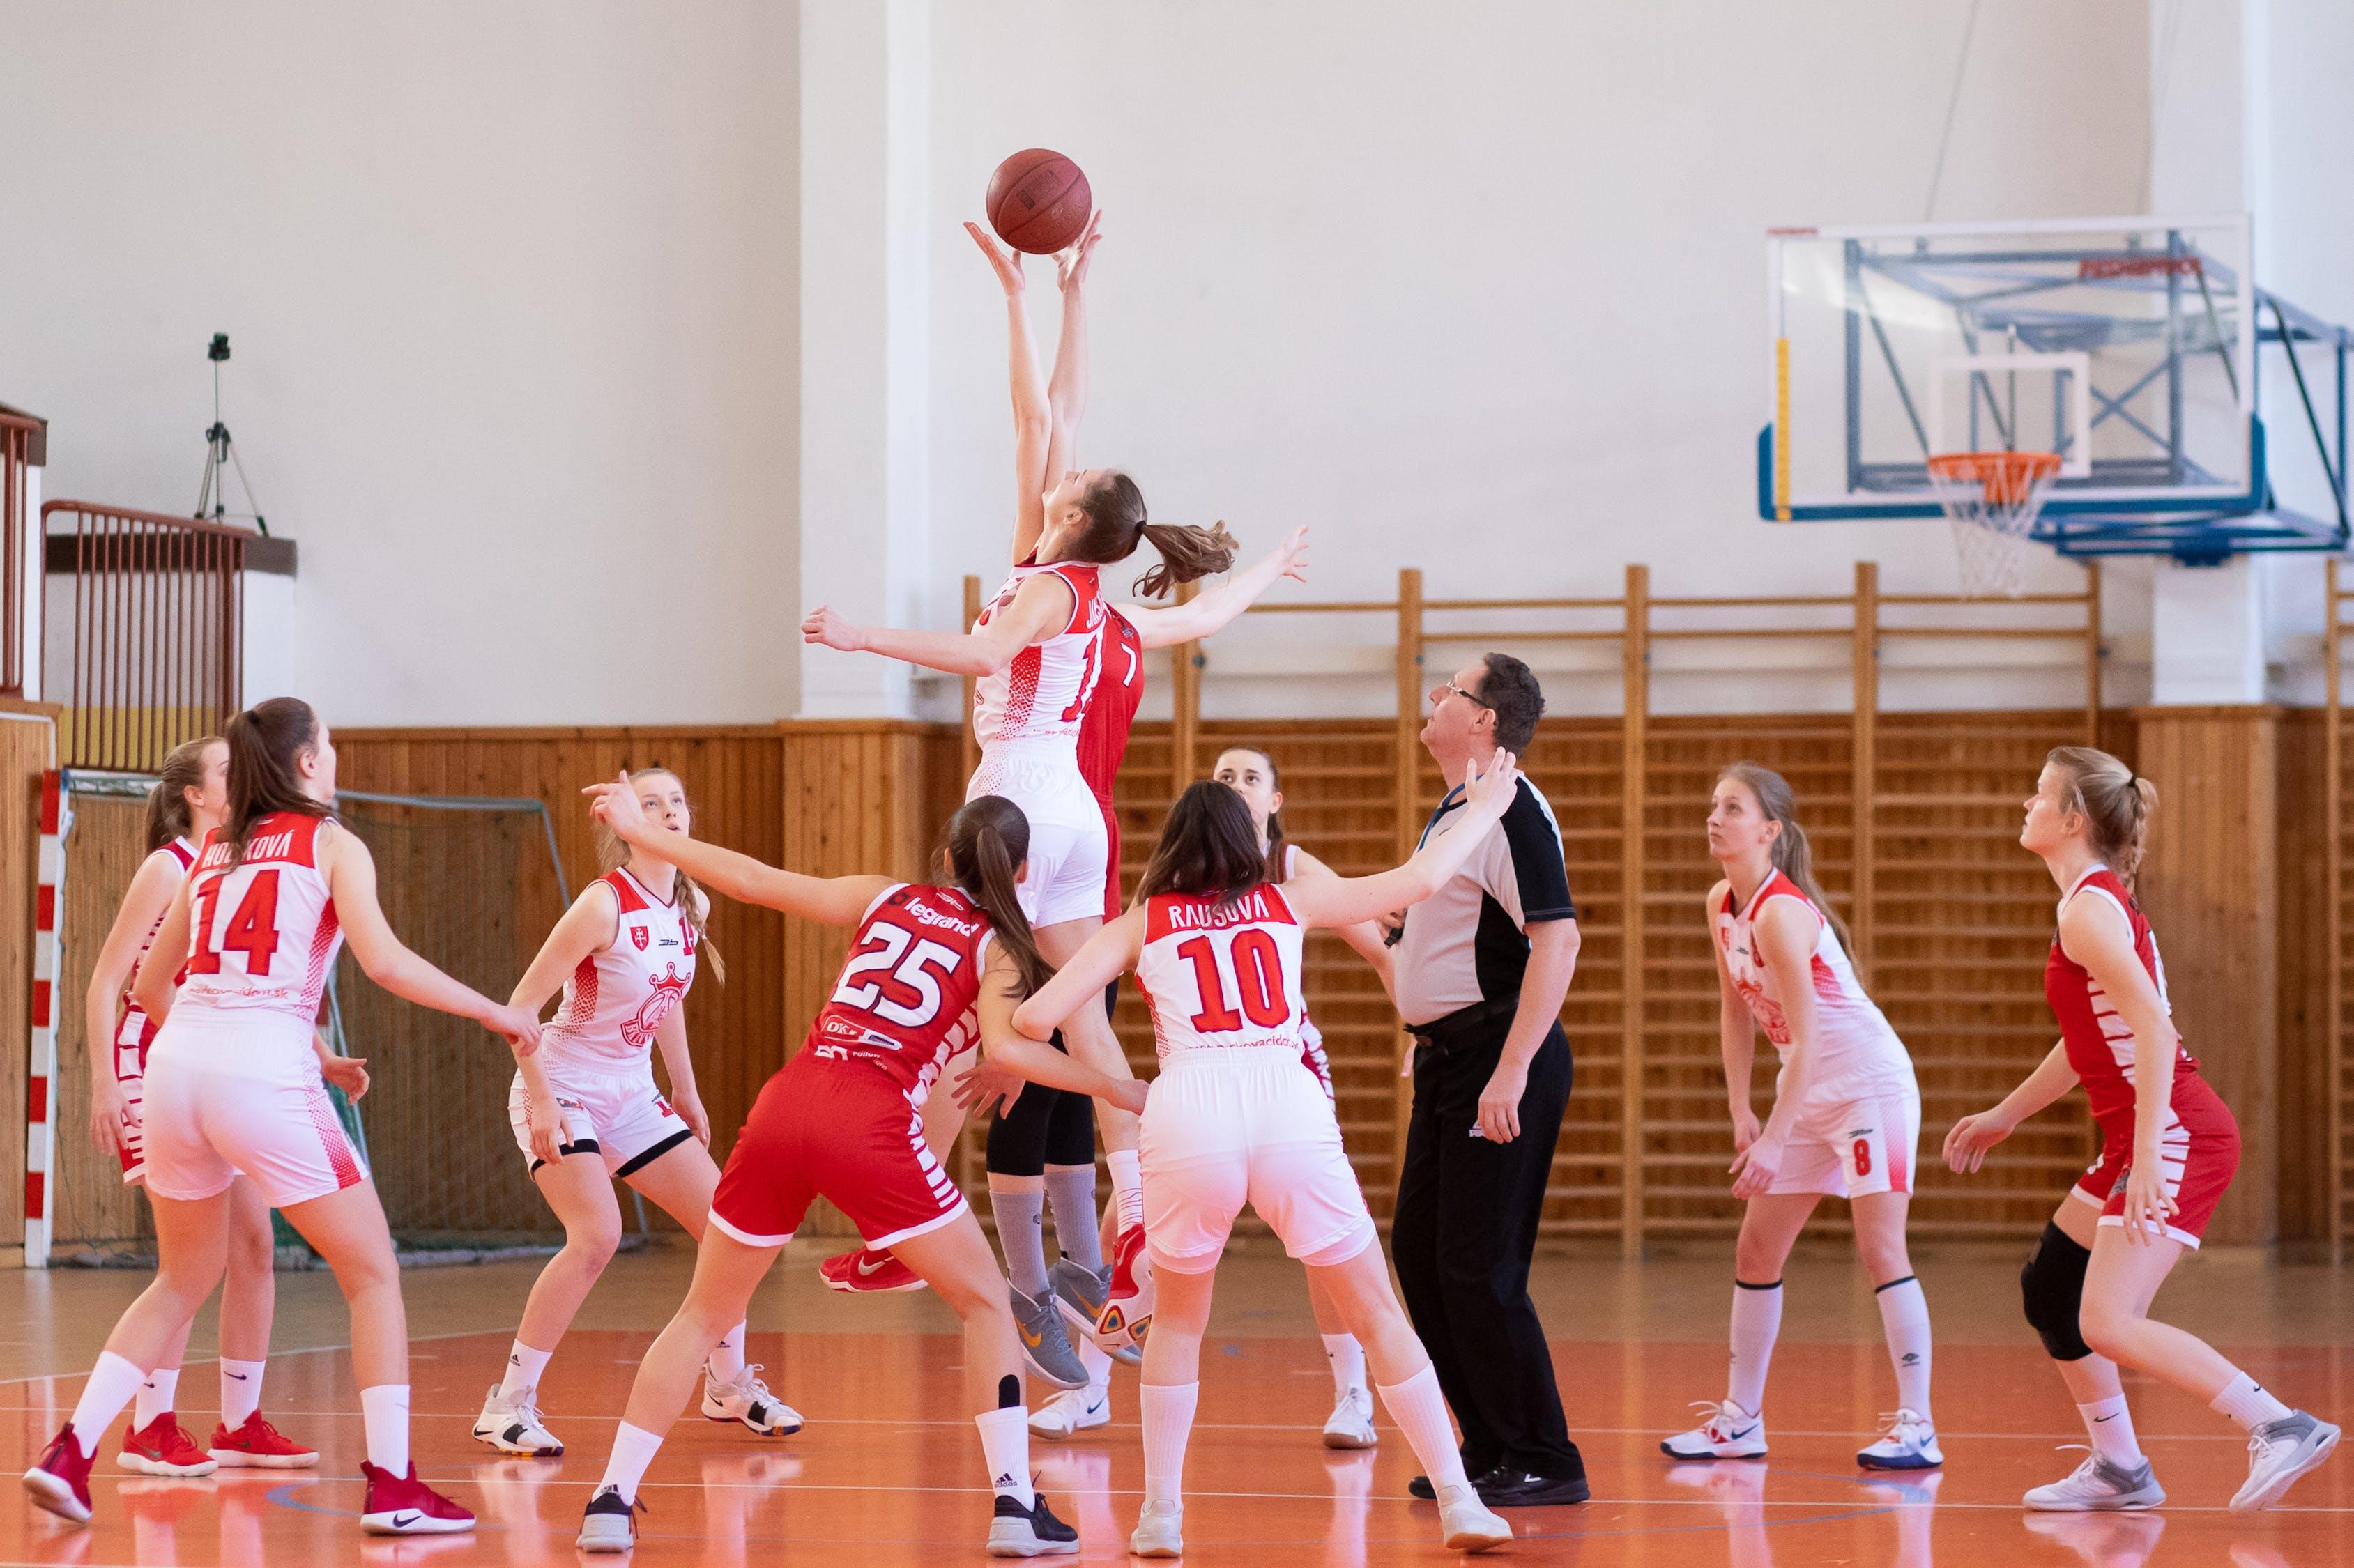 High School Extracurricular Activities - Basketball